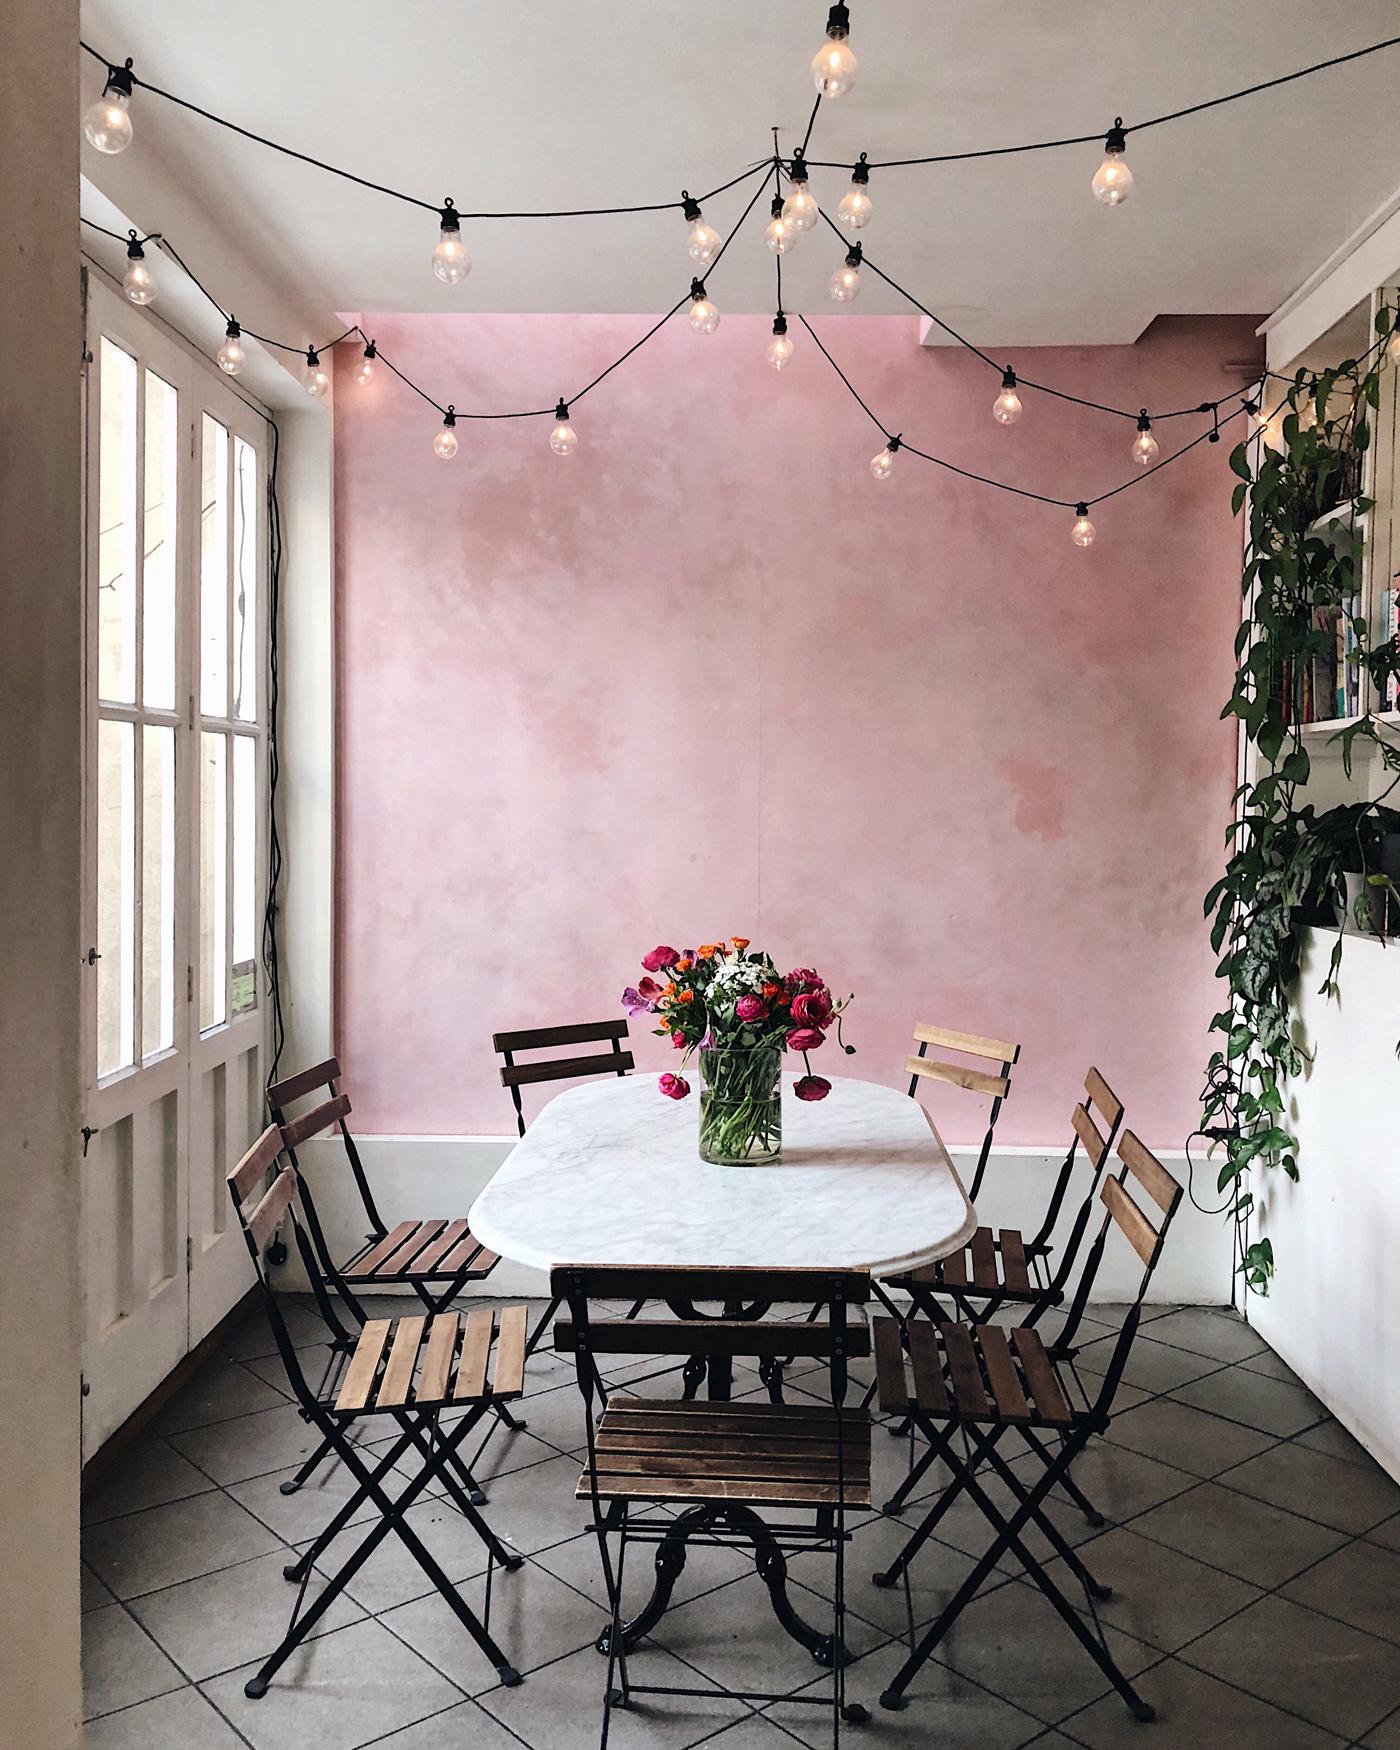 ethereal garden room